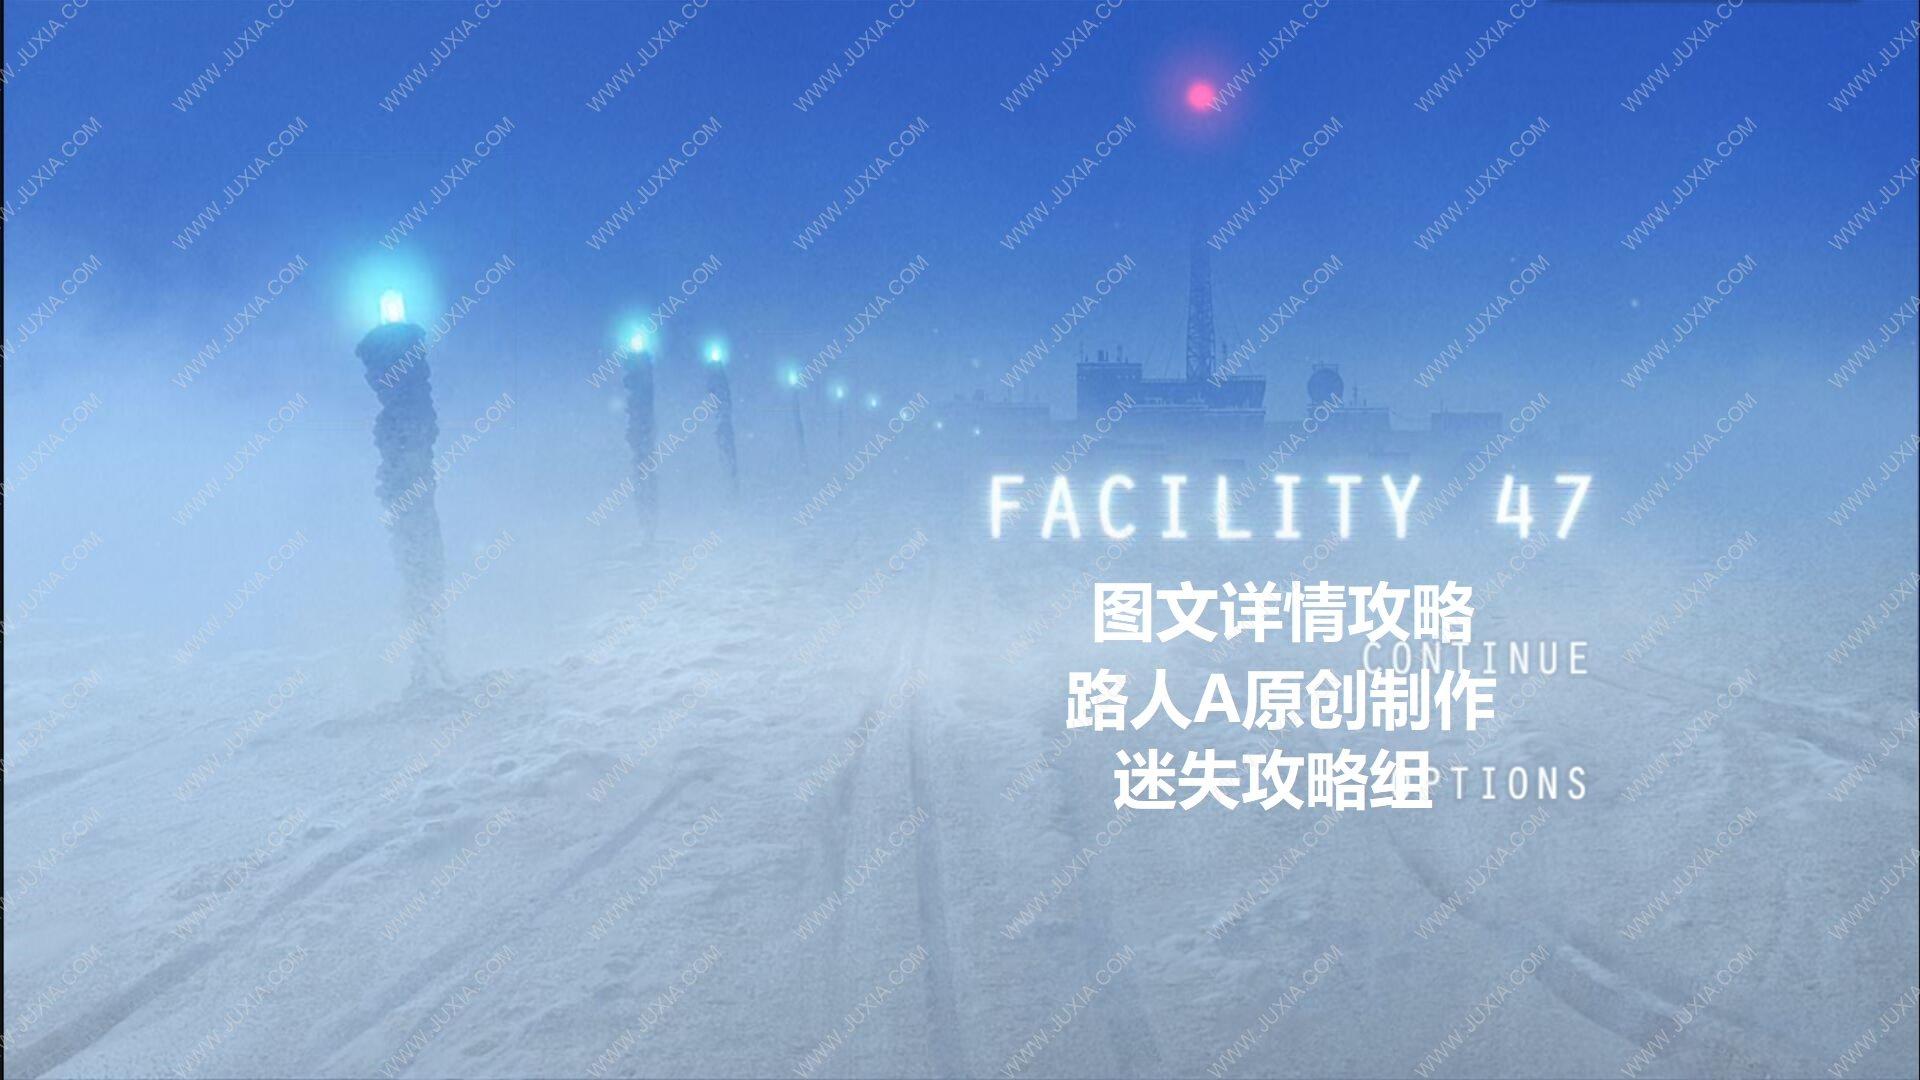 Facility47攻略全流程全关卡 47号房间攻略图文合集